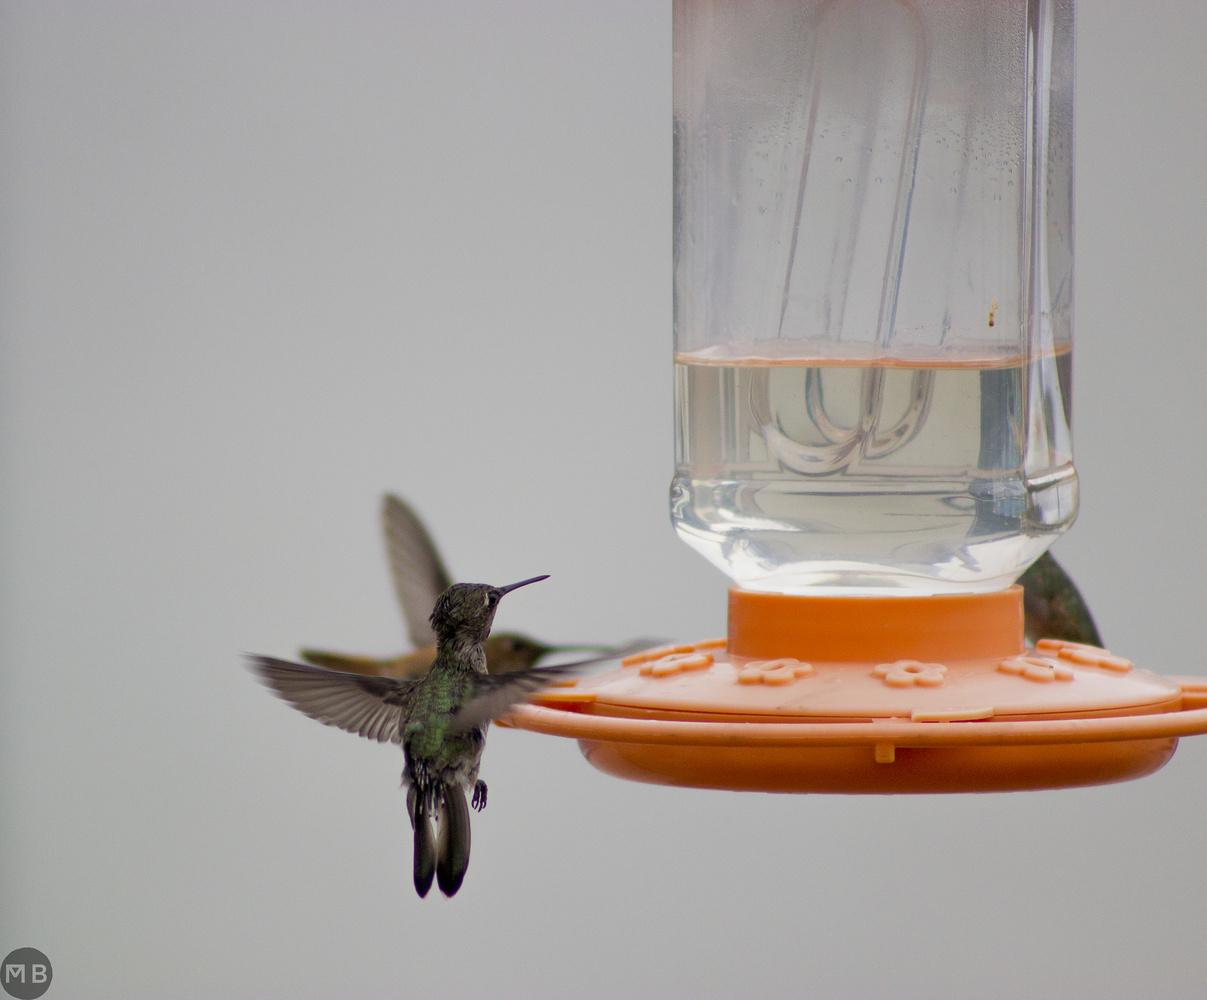 Hummingbird by Markus Baumbach